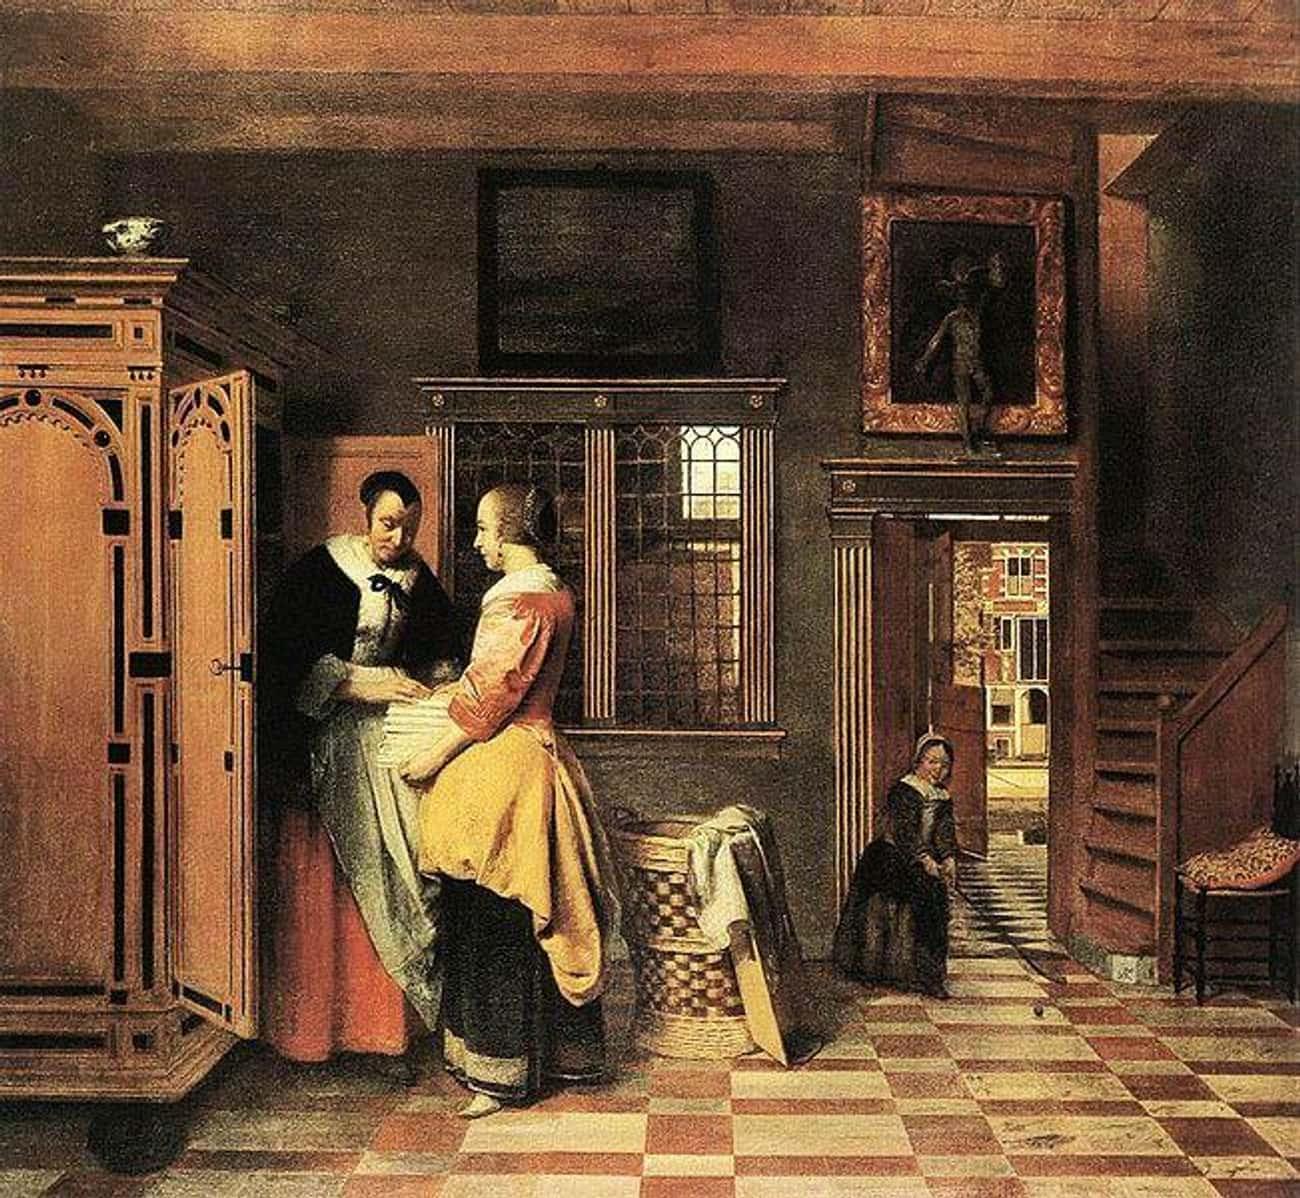 At the Linen Closet